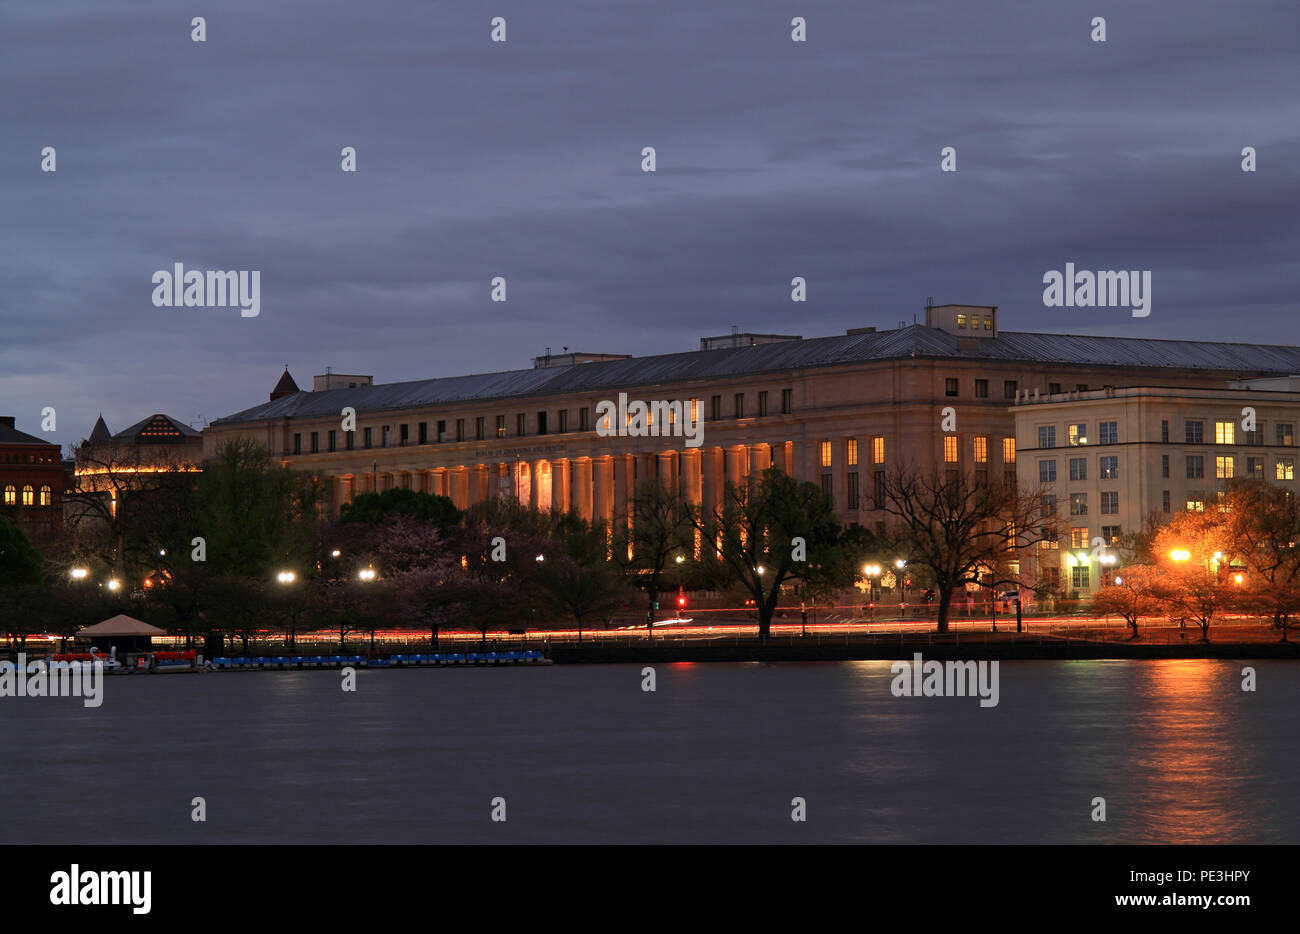 Bureau of Engraving and Printing Edifice in Washington, D.C. - Stock Image